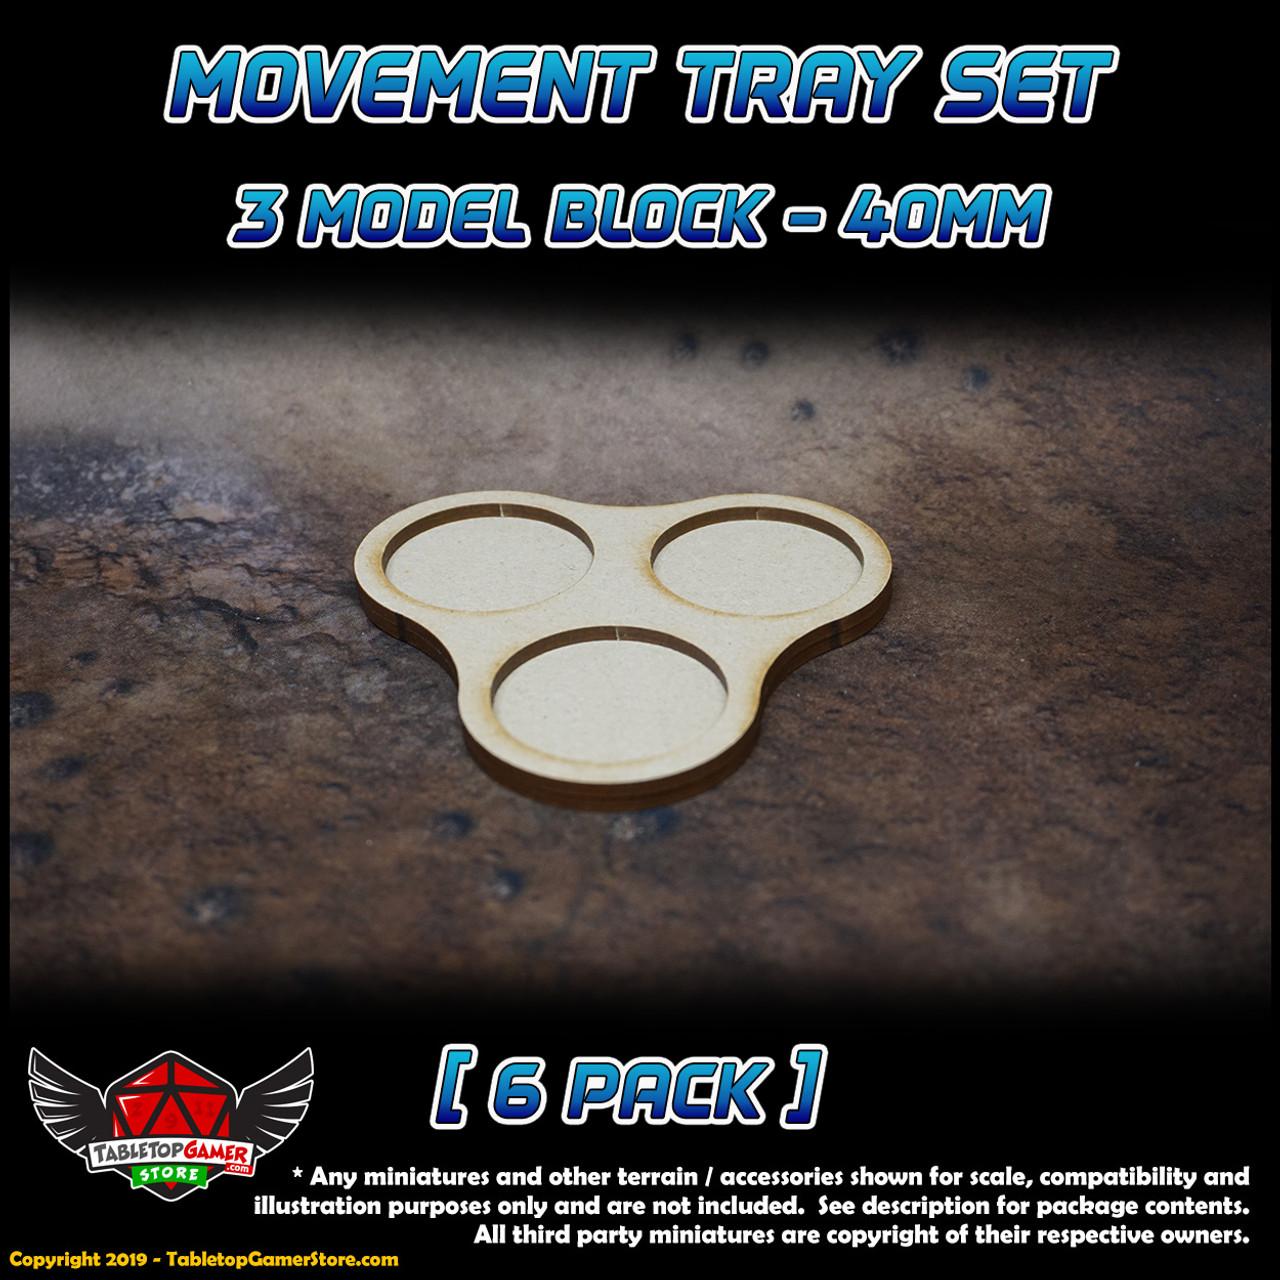 40mm Movement Tray Set - 3 Model Block - 6 Pack